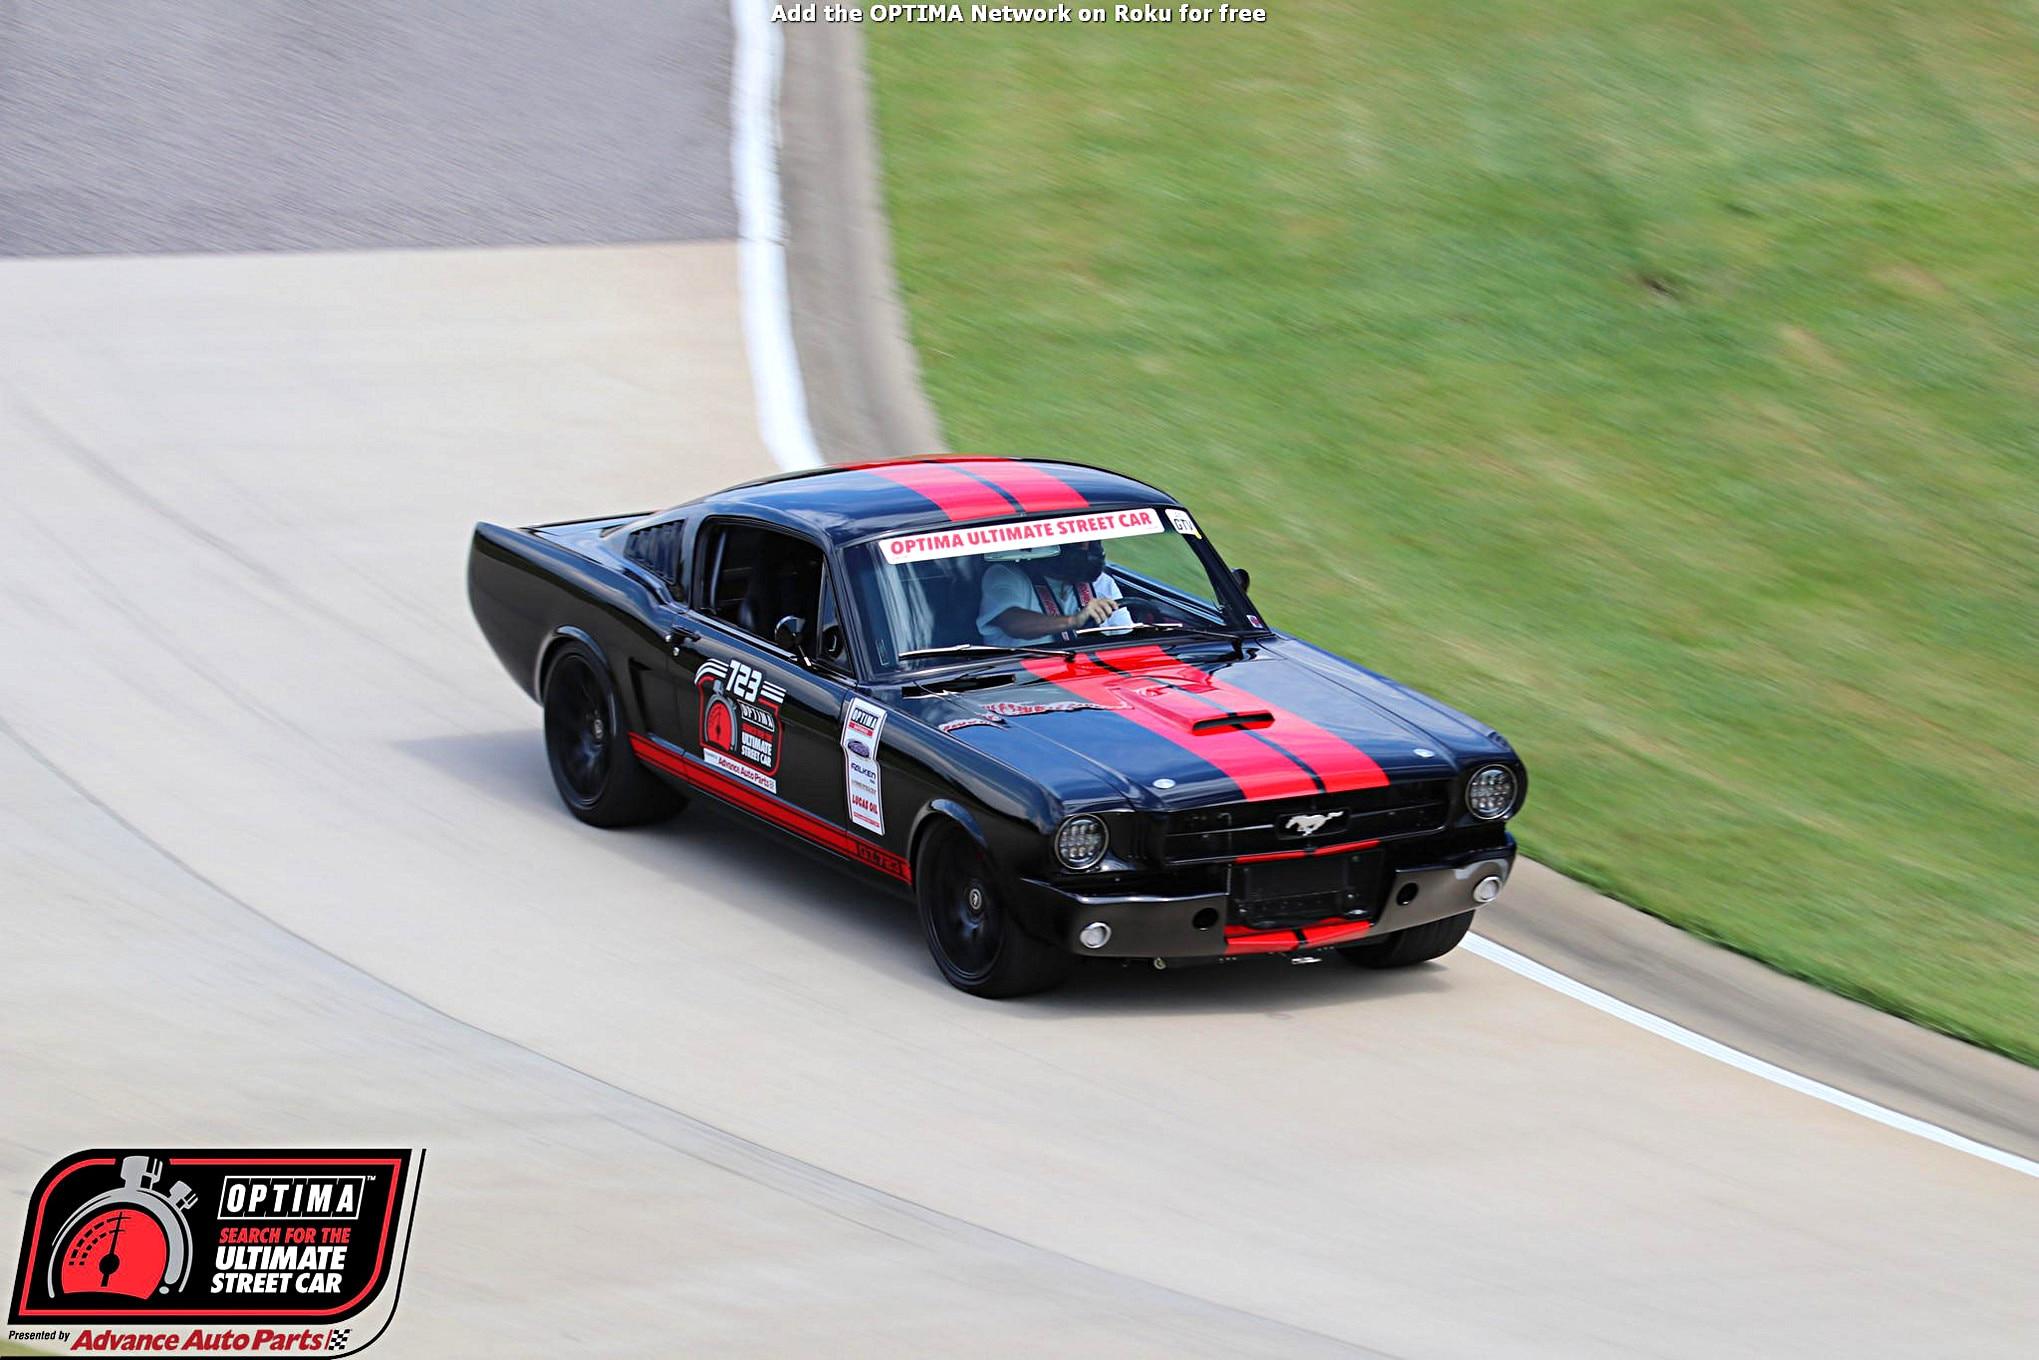 Robert Britton 1965 Ford Mustang DriveOPTIMA Barber Motorsports Park 2018 423